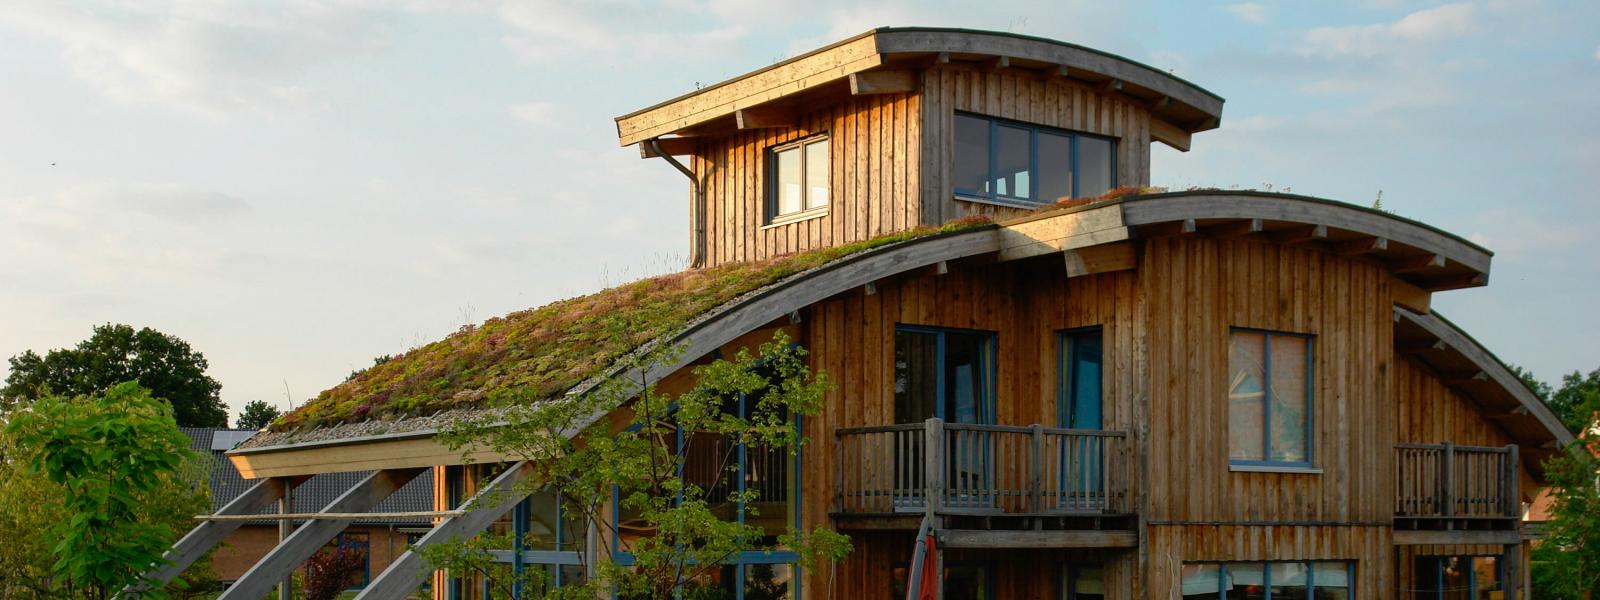 Mehr Lebensqualität dank grünem Dach.